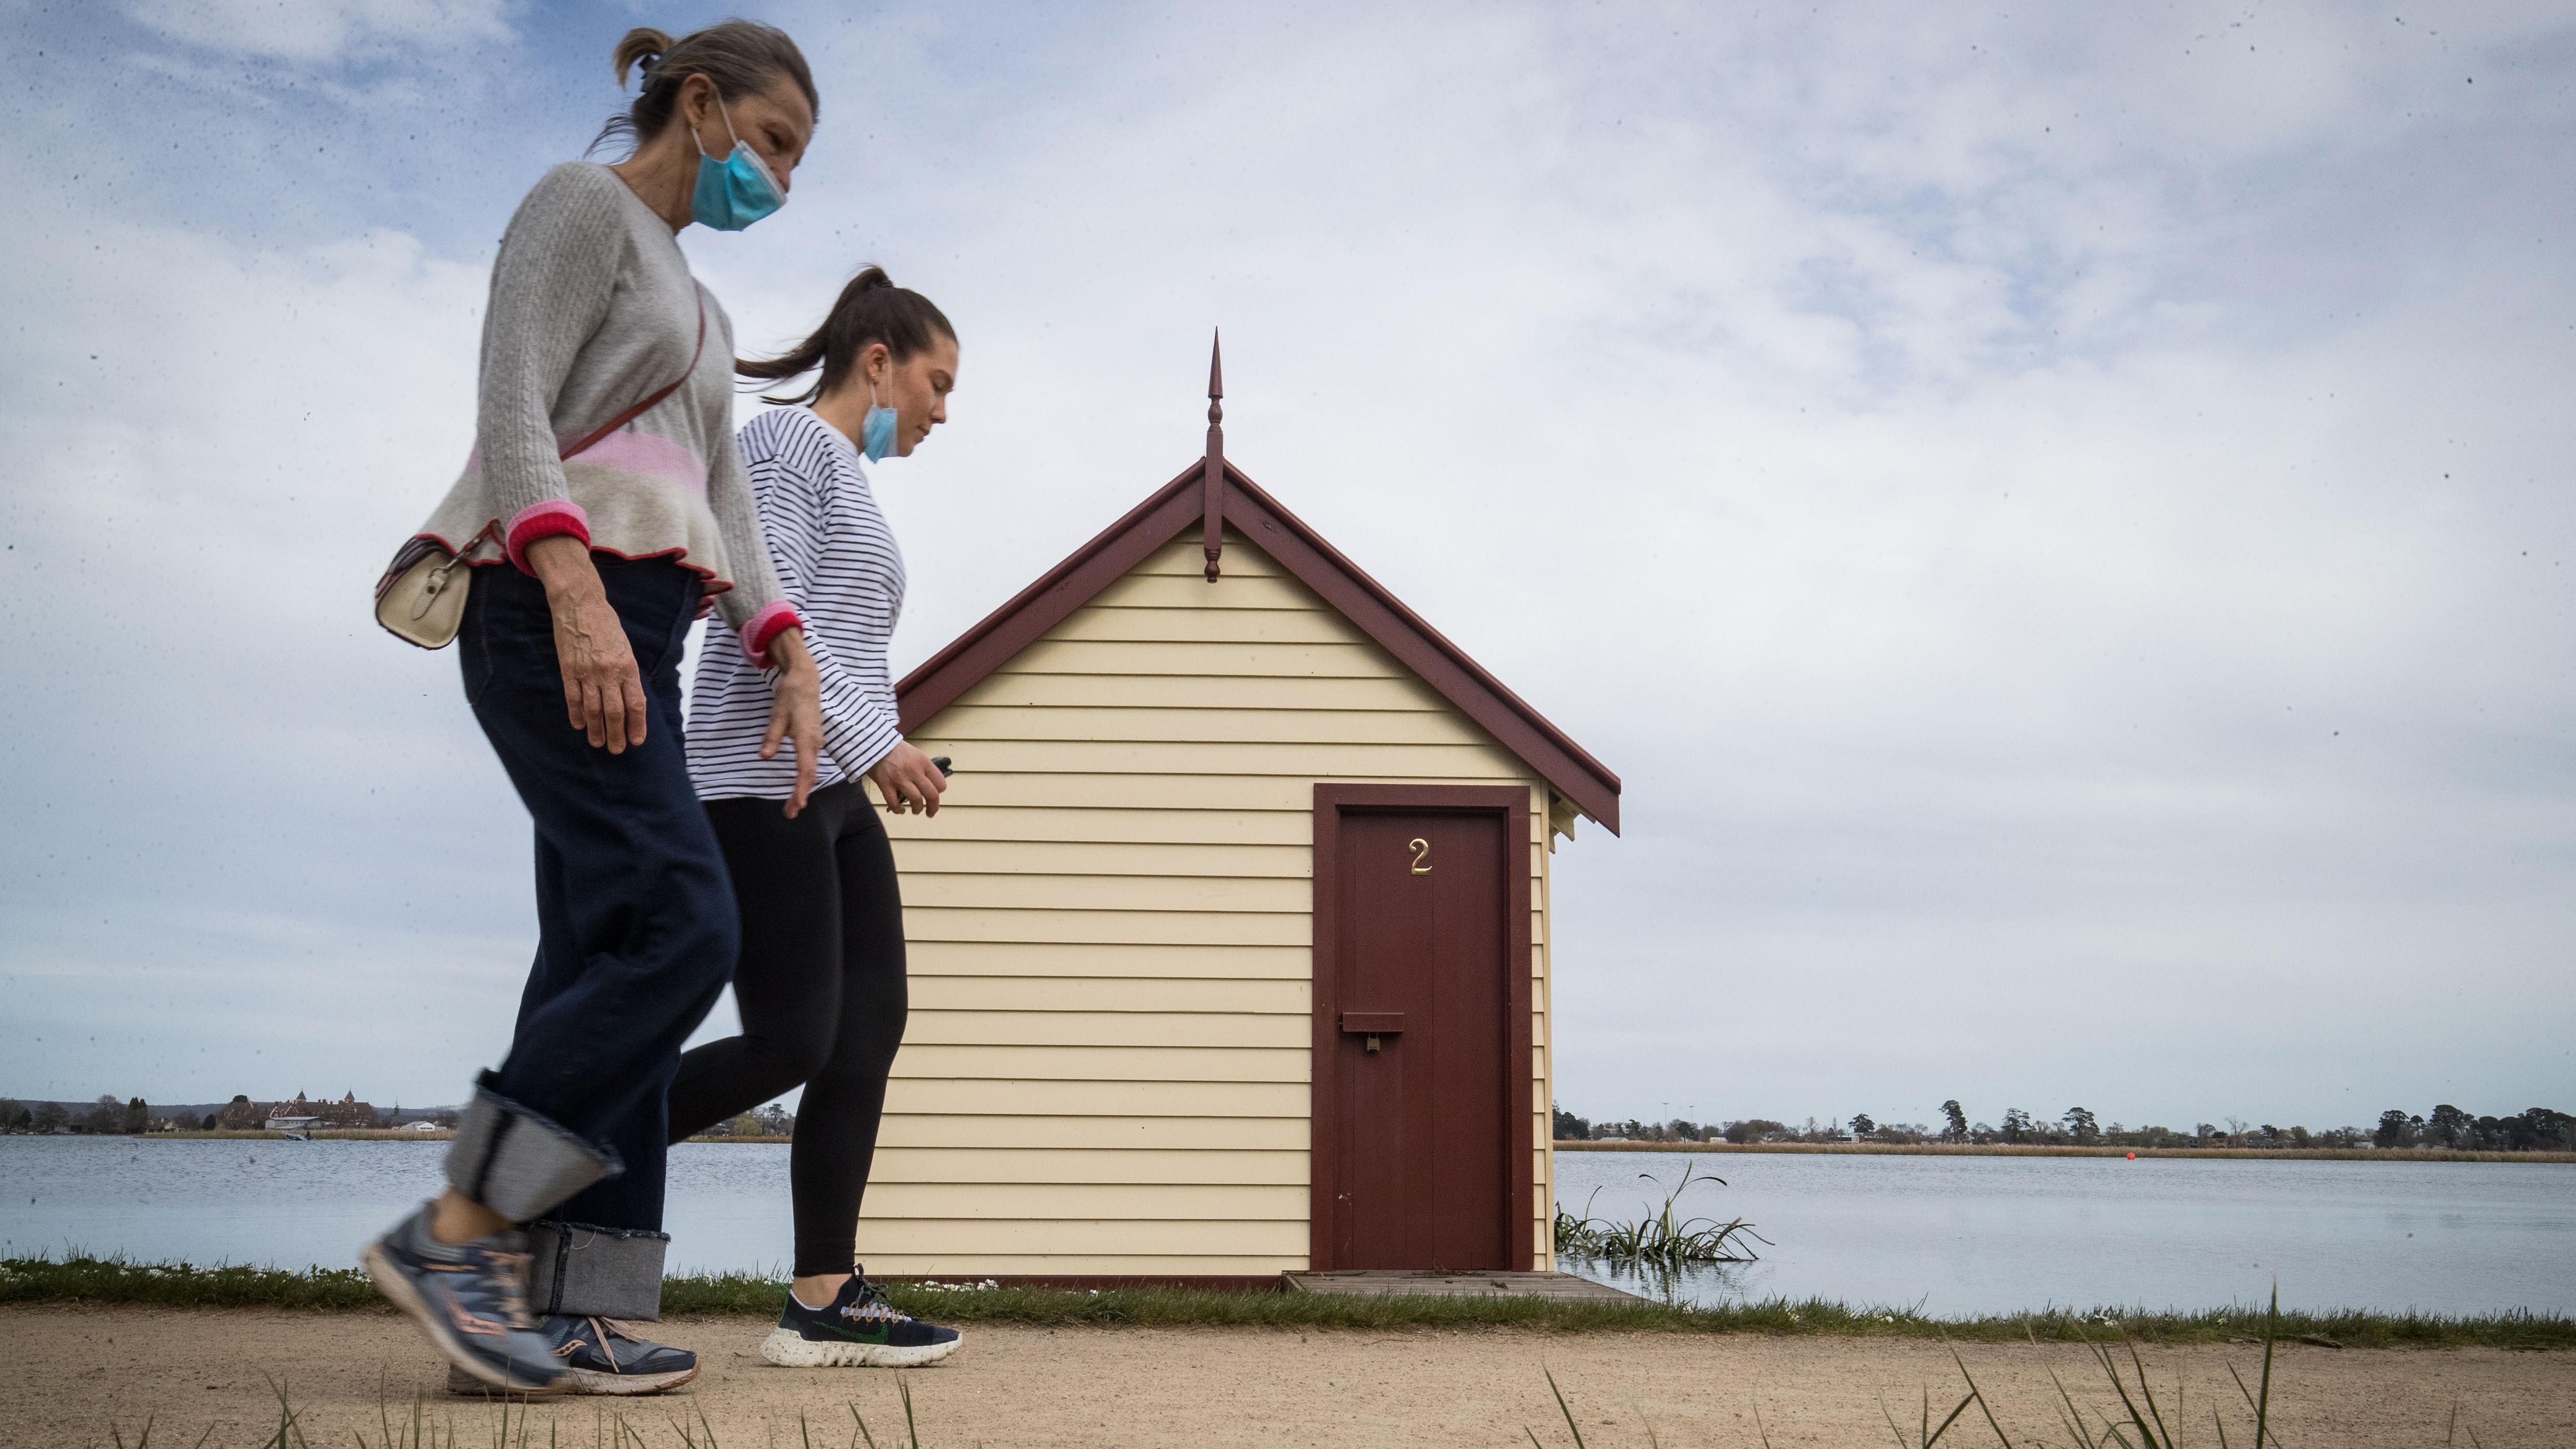 People walk around Lake Wendouree in Ballarat, Victoria, where restrictions have eased.